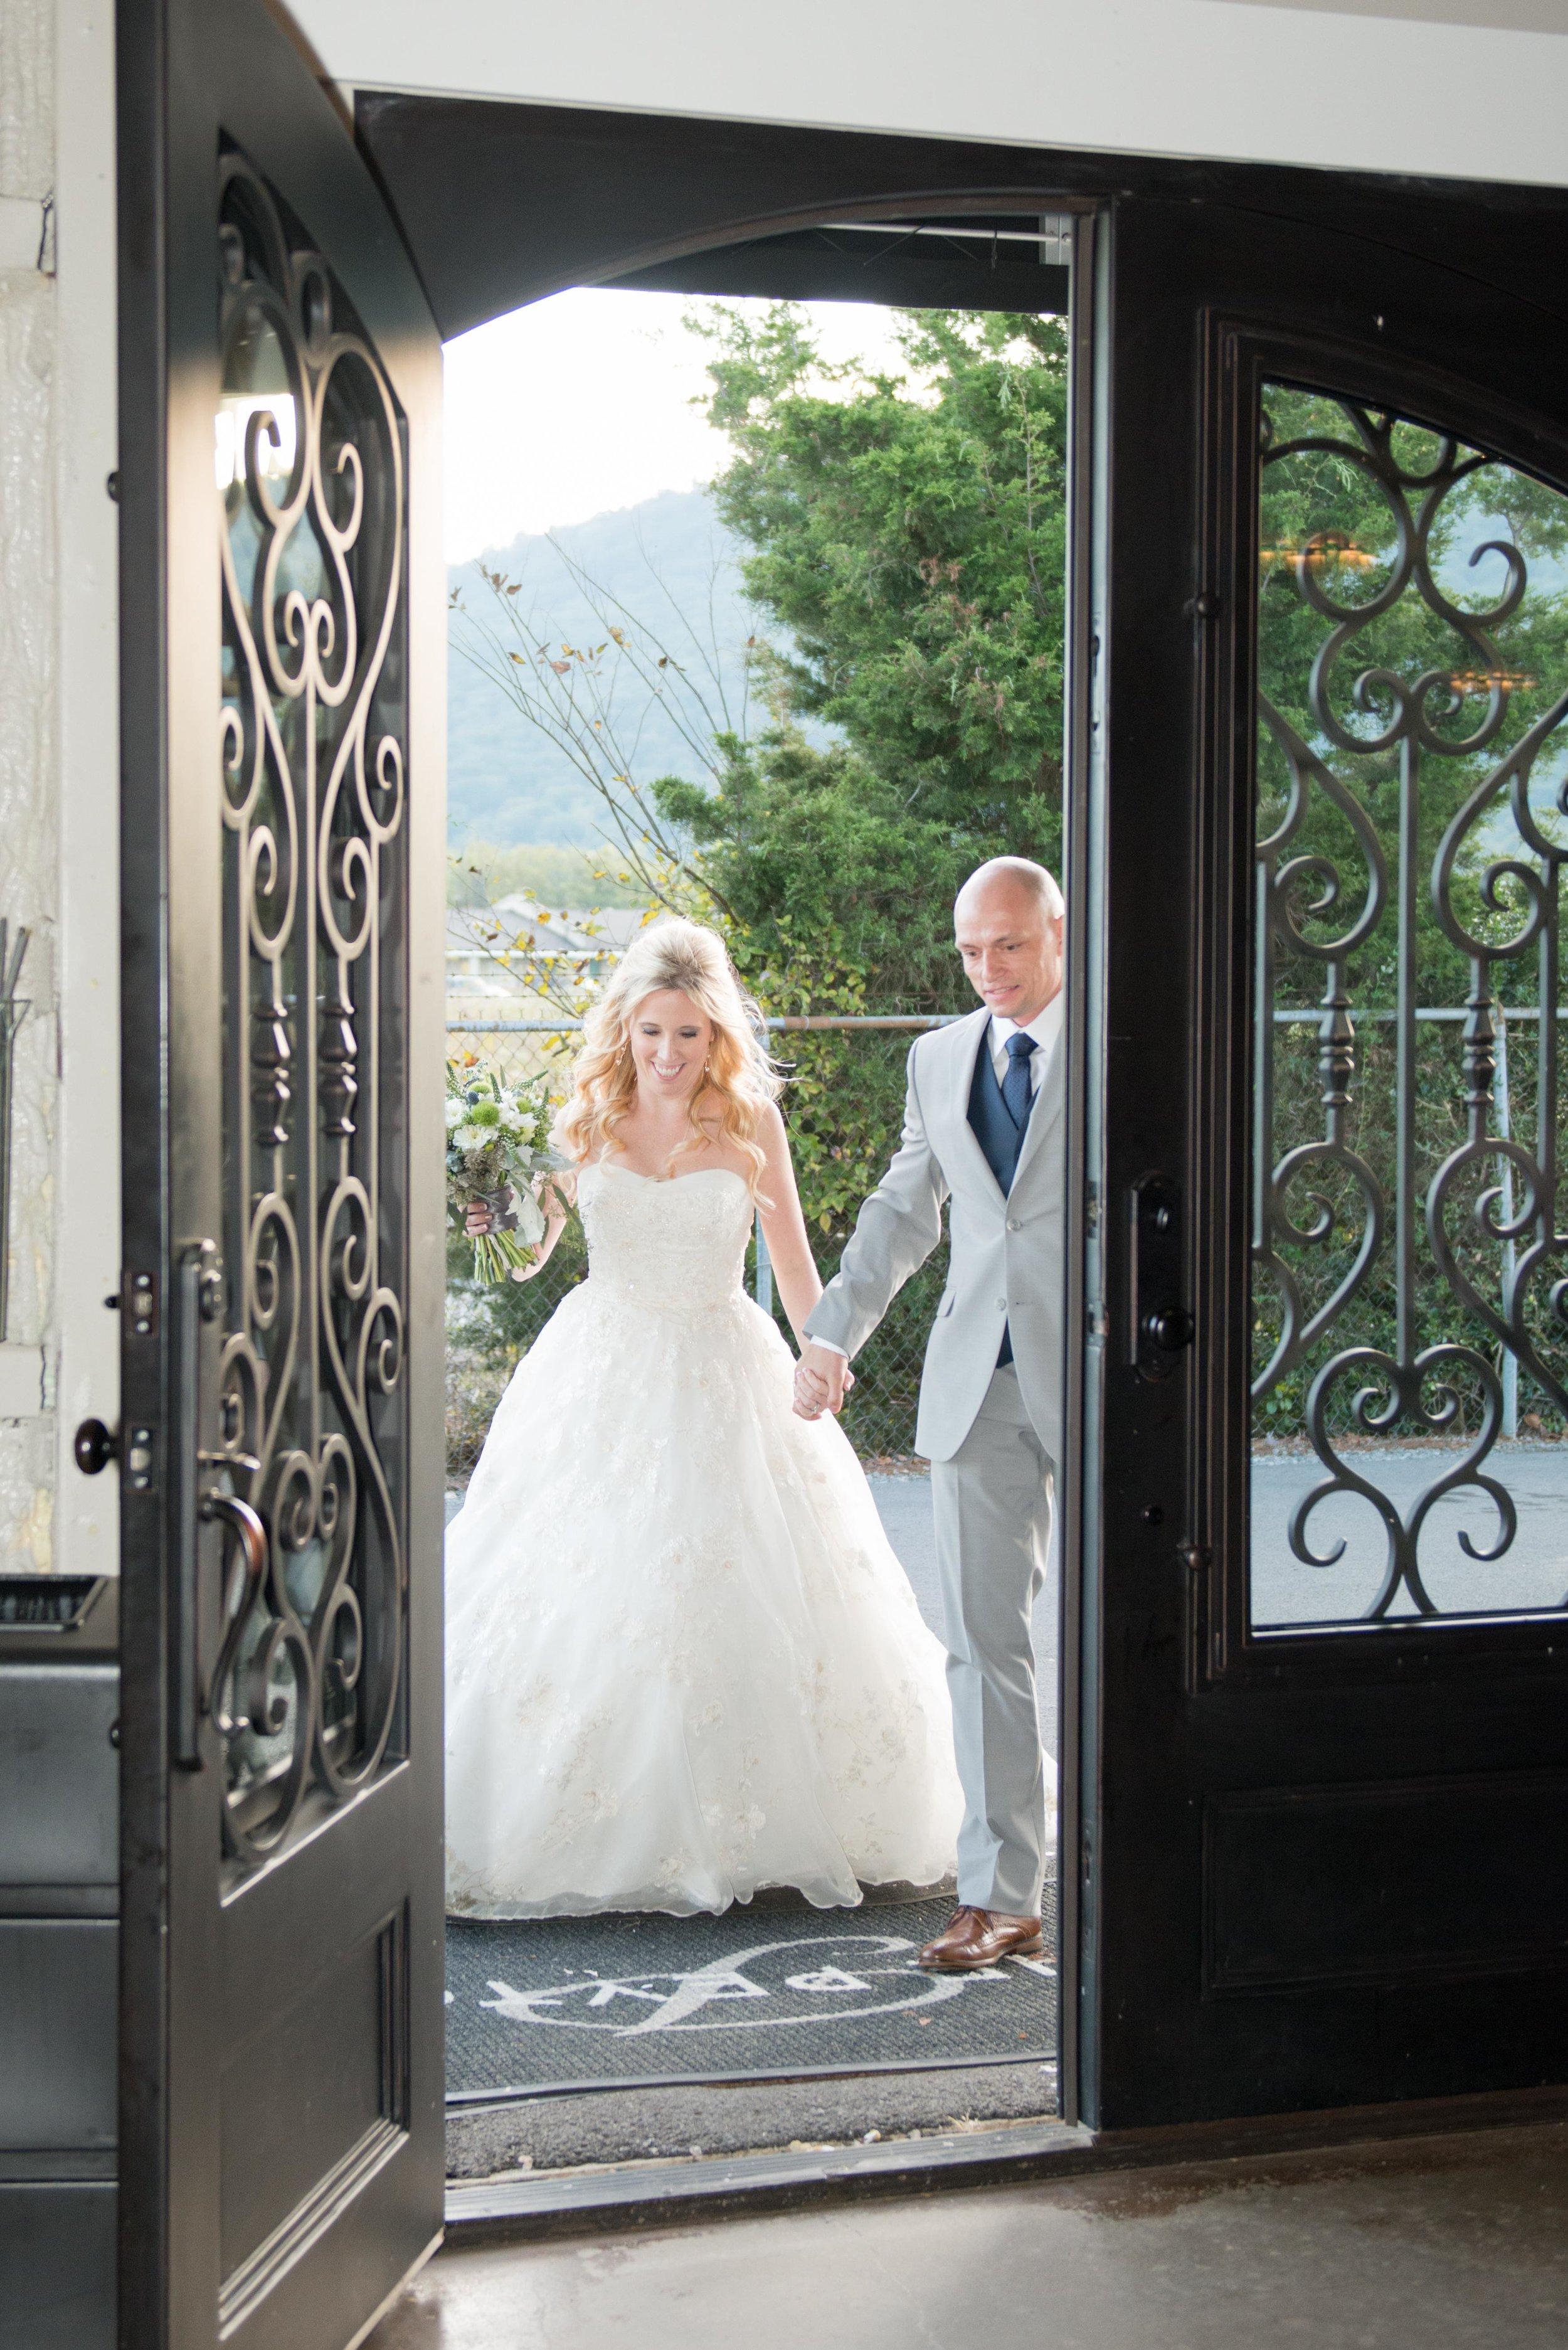 00001_Kuhnert-Wedding-89.jpg